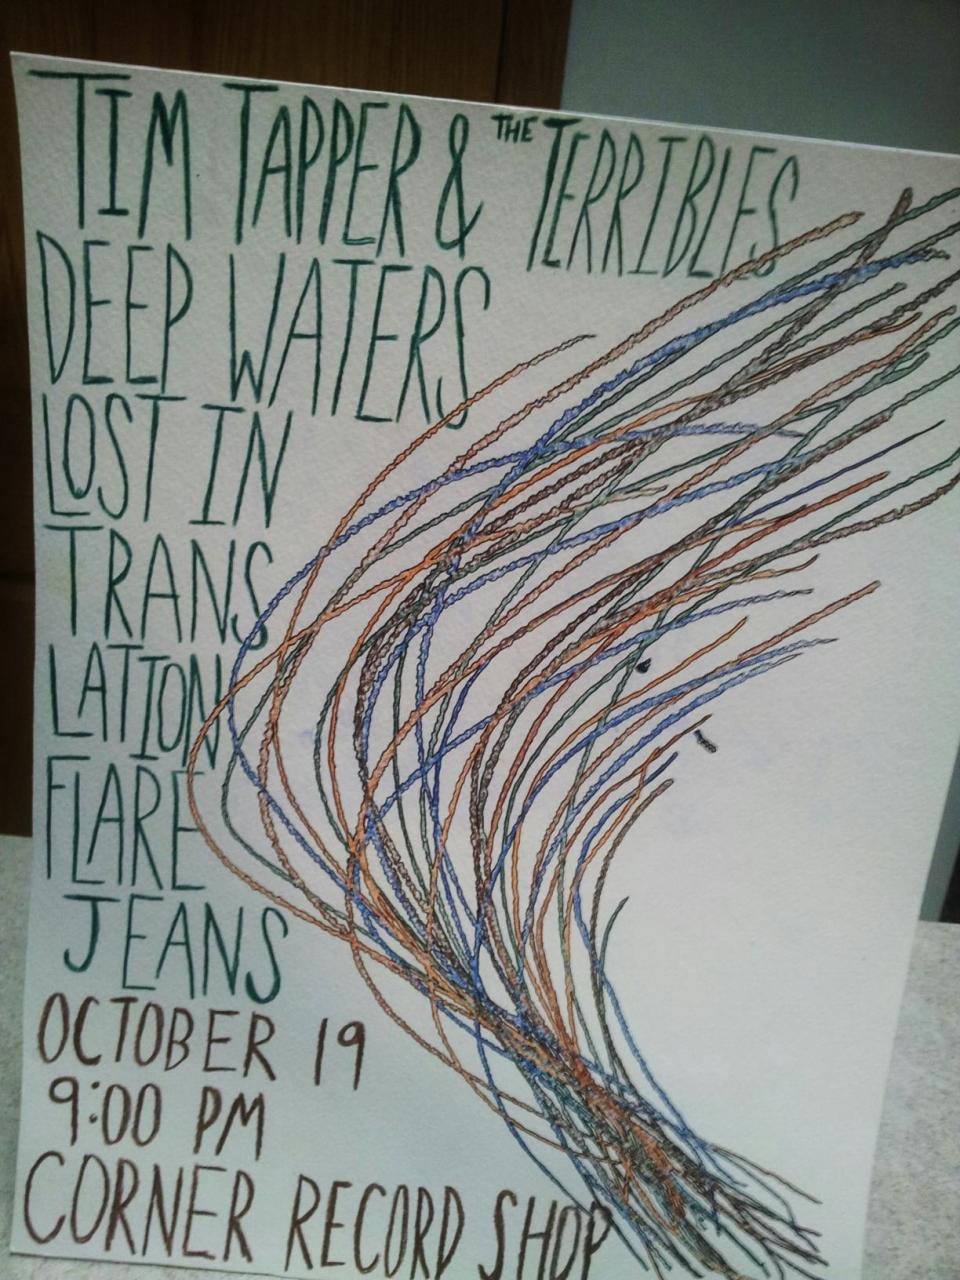 DEEP WATERS ACOUSTIC SET OCTOBER 19